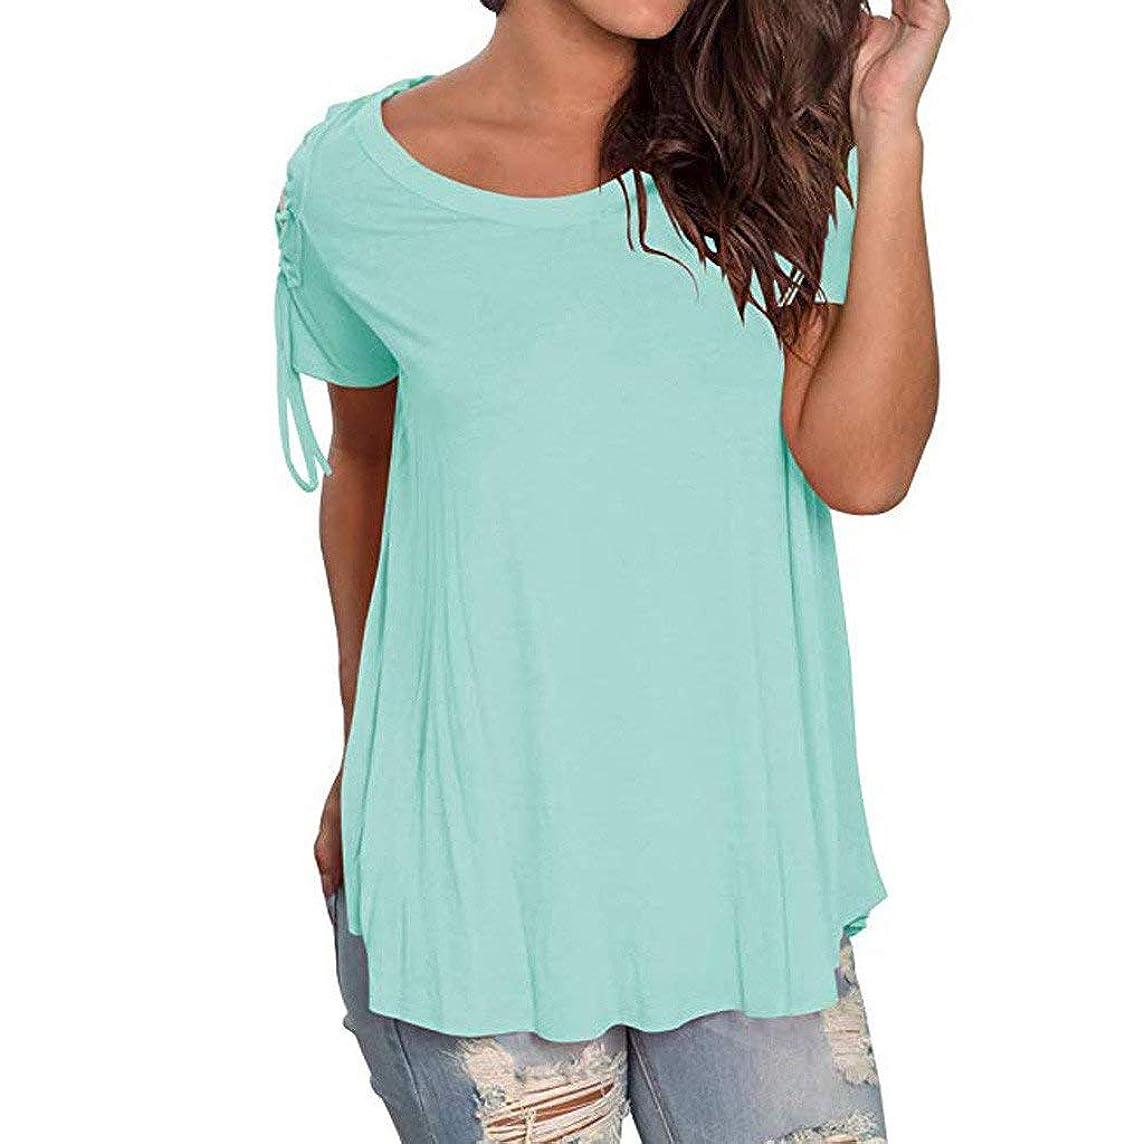 Women's Casual T Shirt V Neck Criss Cross Cold Shoulder Tops Short Sleeve Tshirt Flare Tunic Tops for Leggings Flowy Blouse